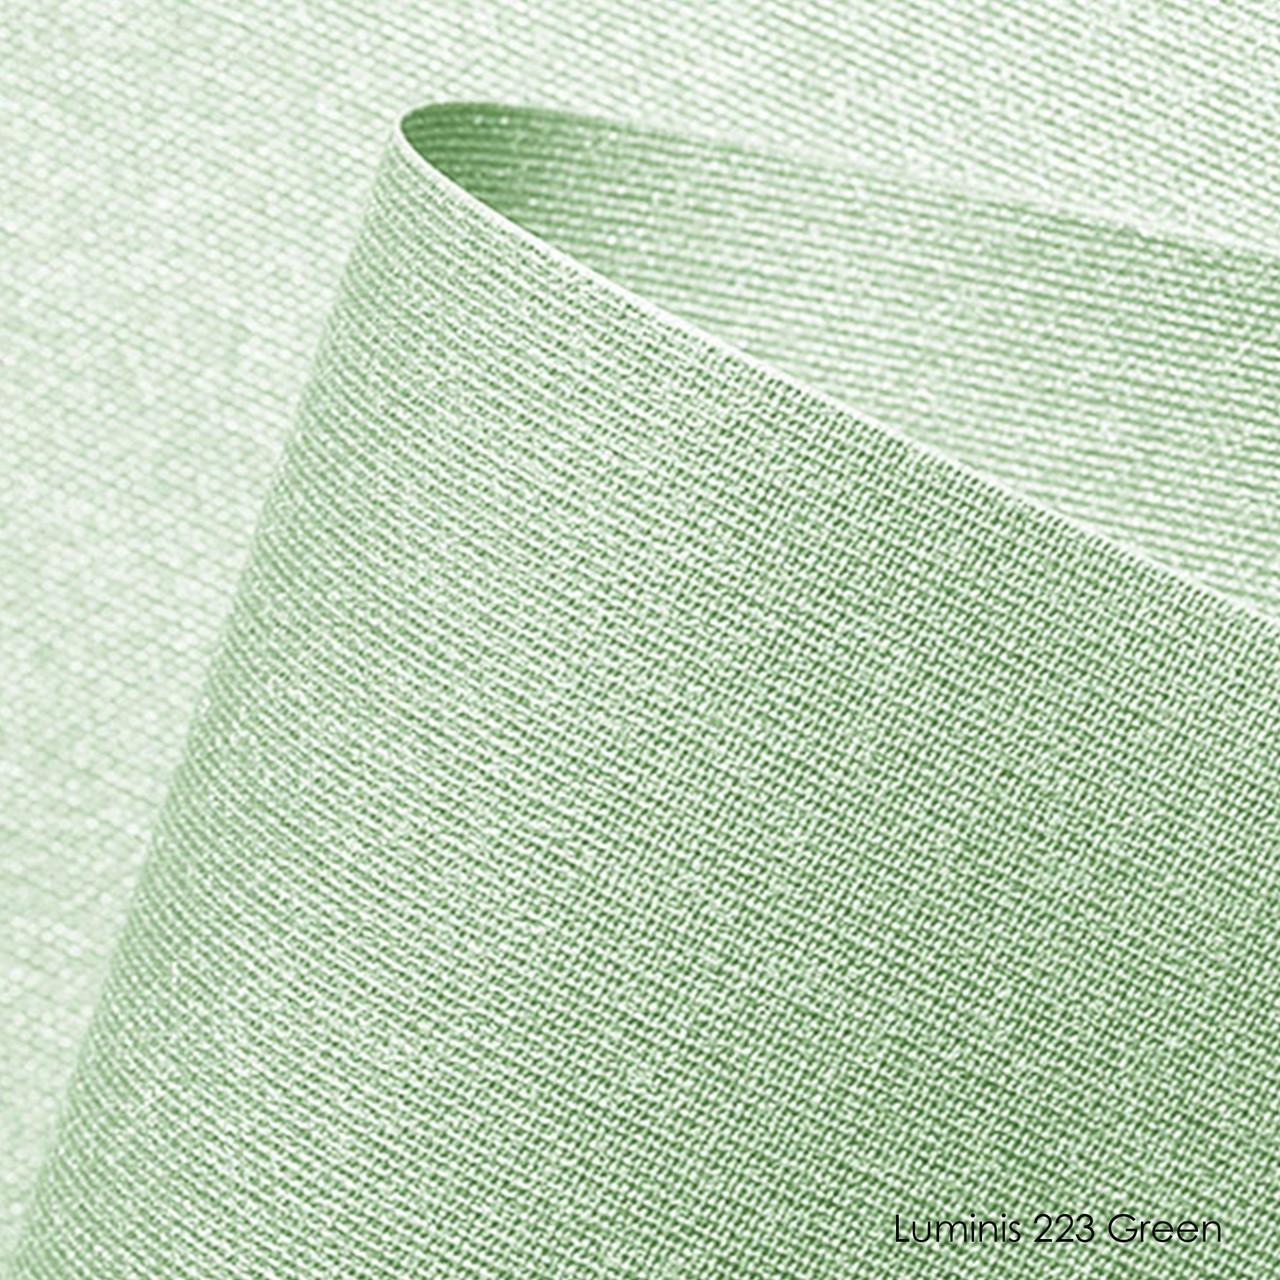 Ролеты тканевые Luminis-223 green